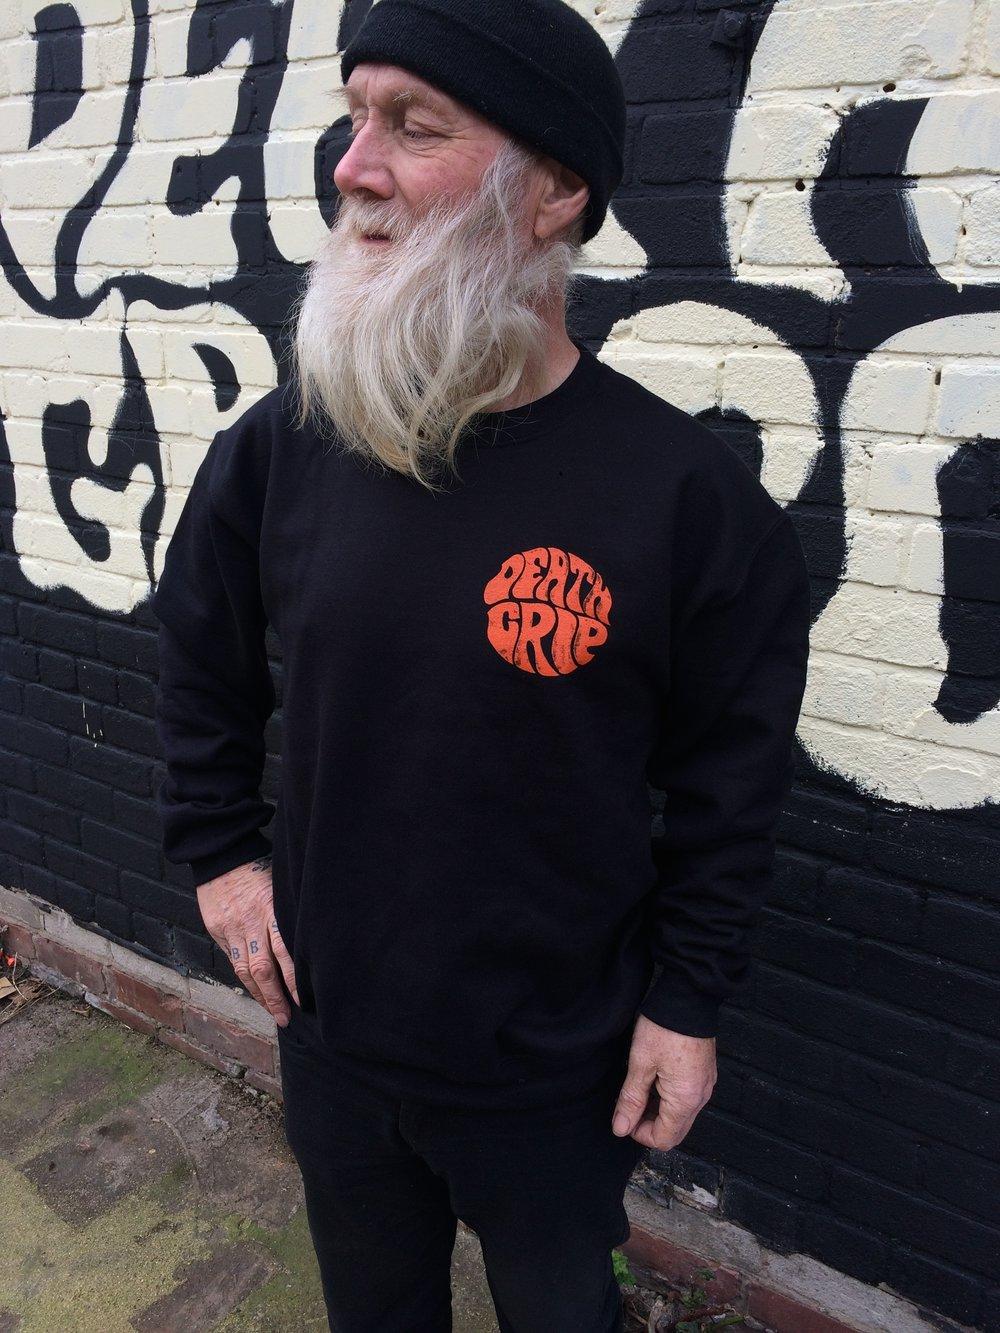 Image of deathgrip sweater